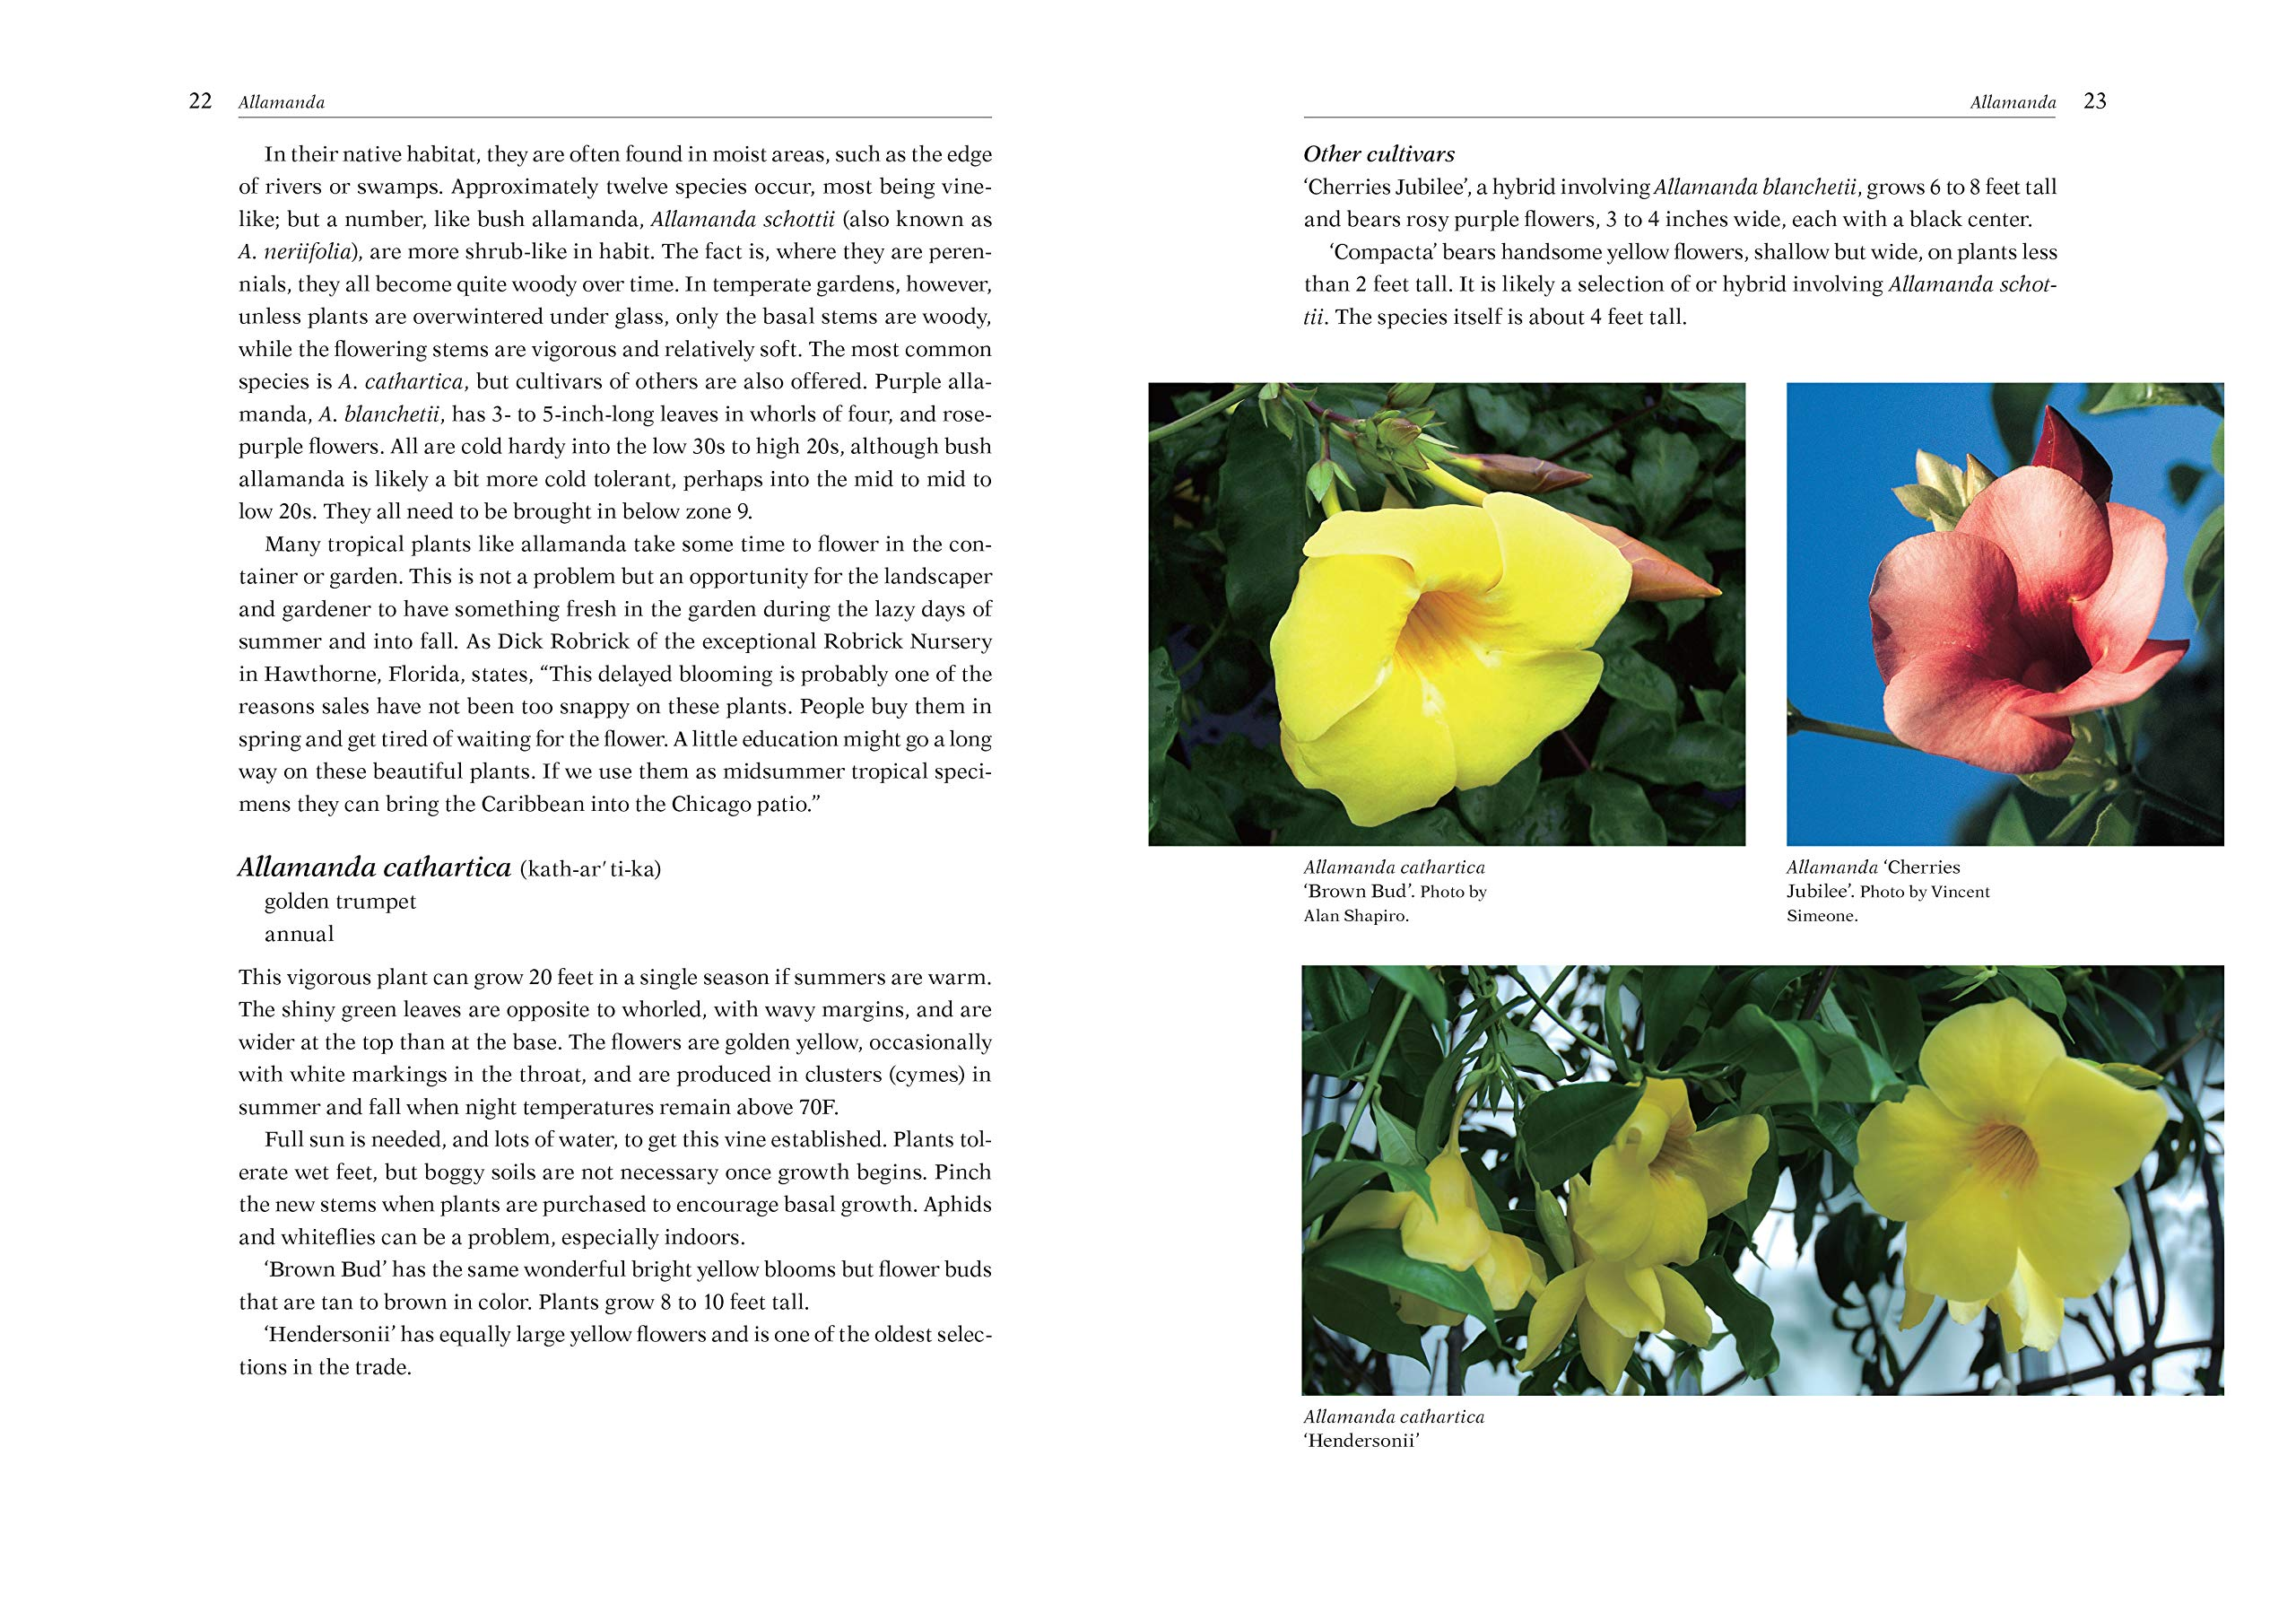 Armitages Vines and Climbers: Amazon.es: Armitage, Allan M ...